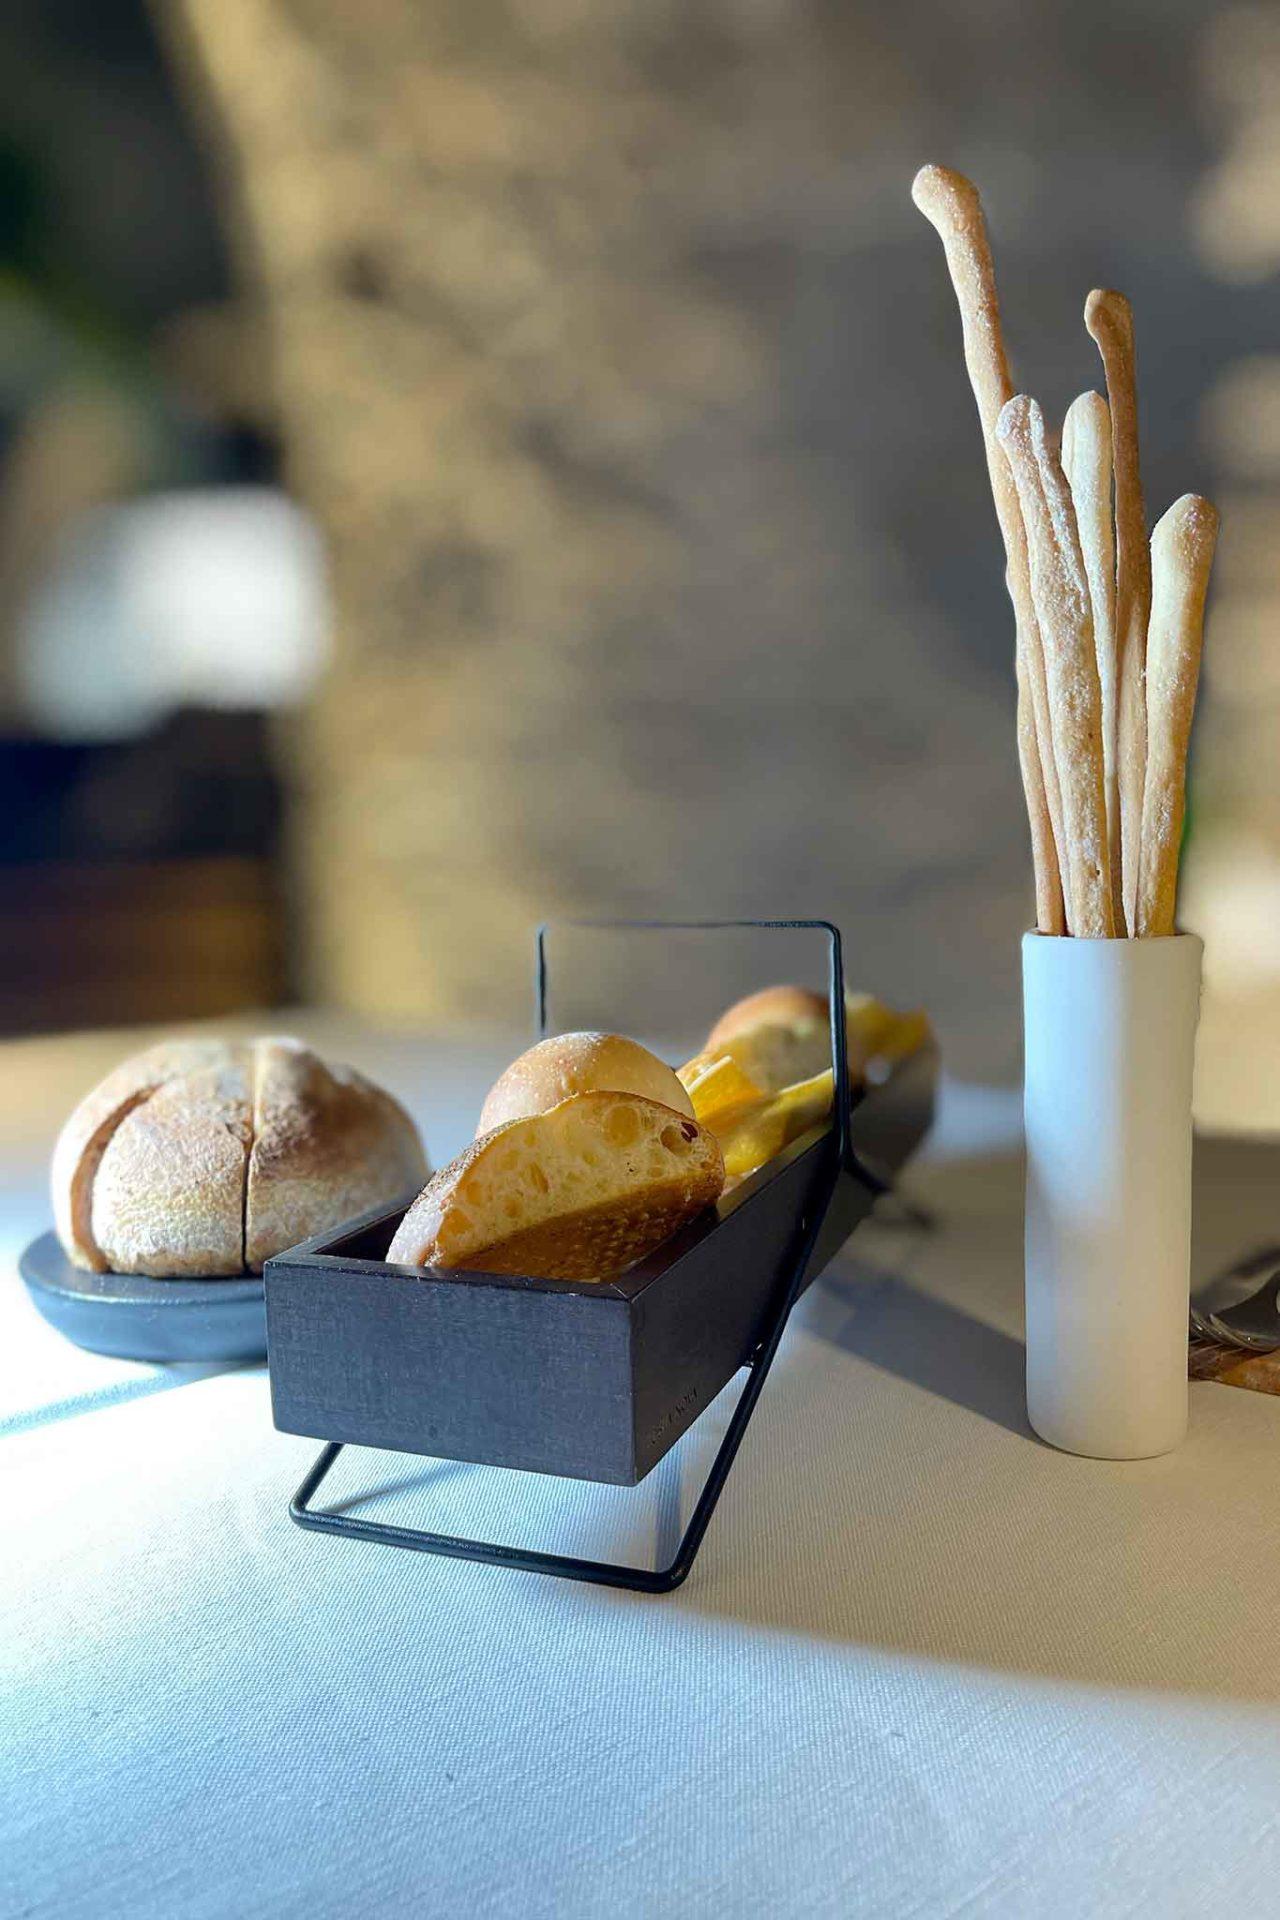 Hoshi Salerno ristorante giapponese pane